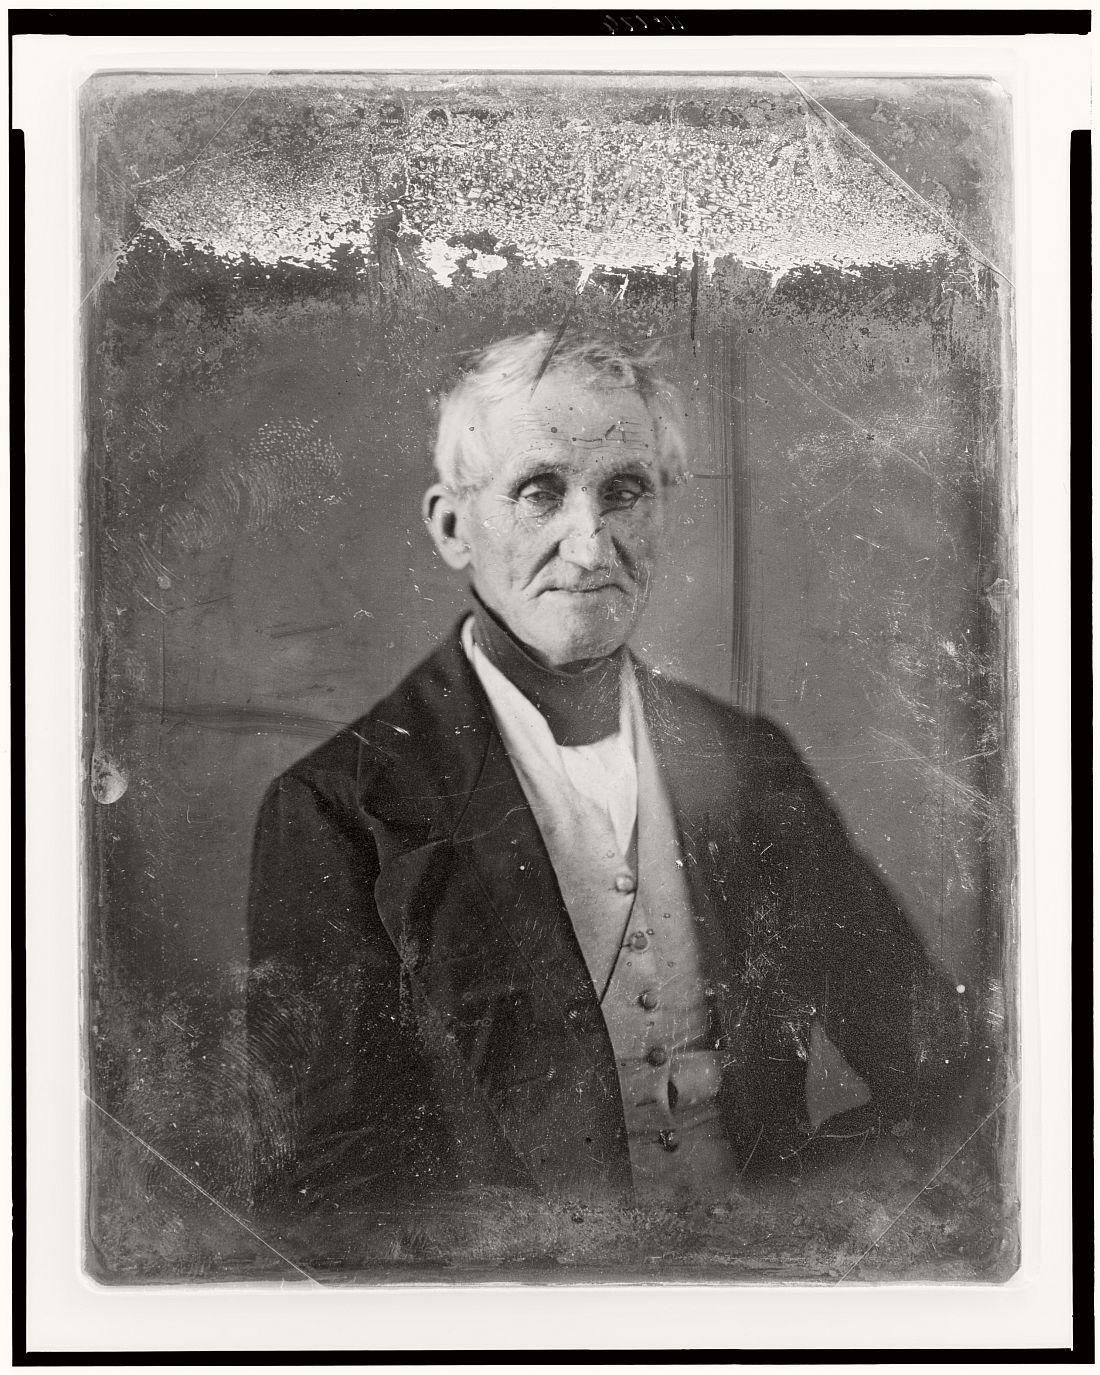 vintage-daguerreotype-portraits-from-xix-century-1844-1860-64